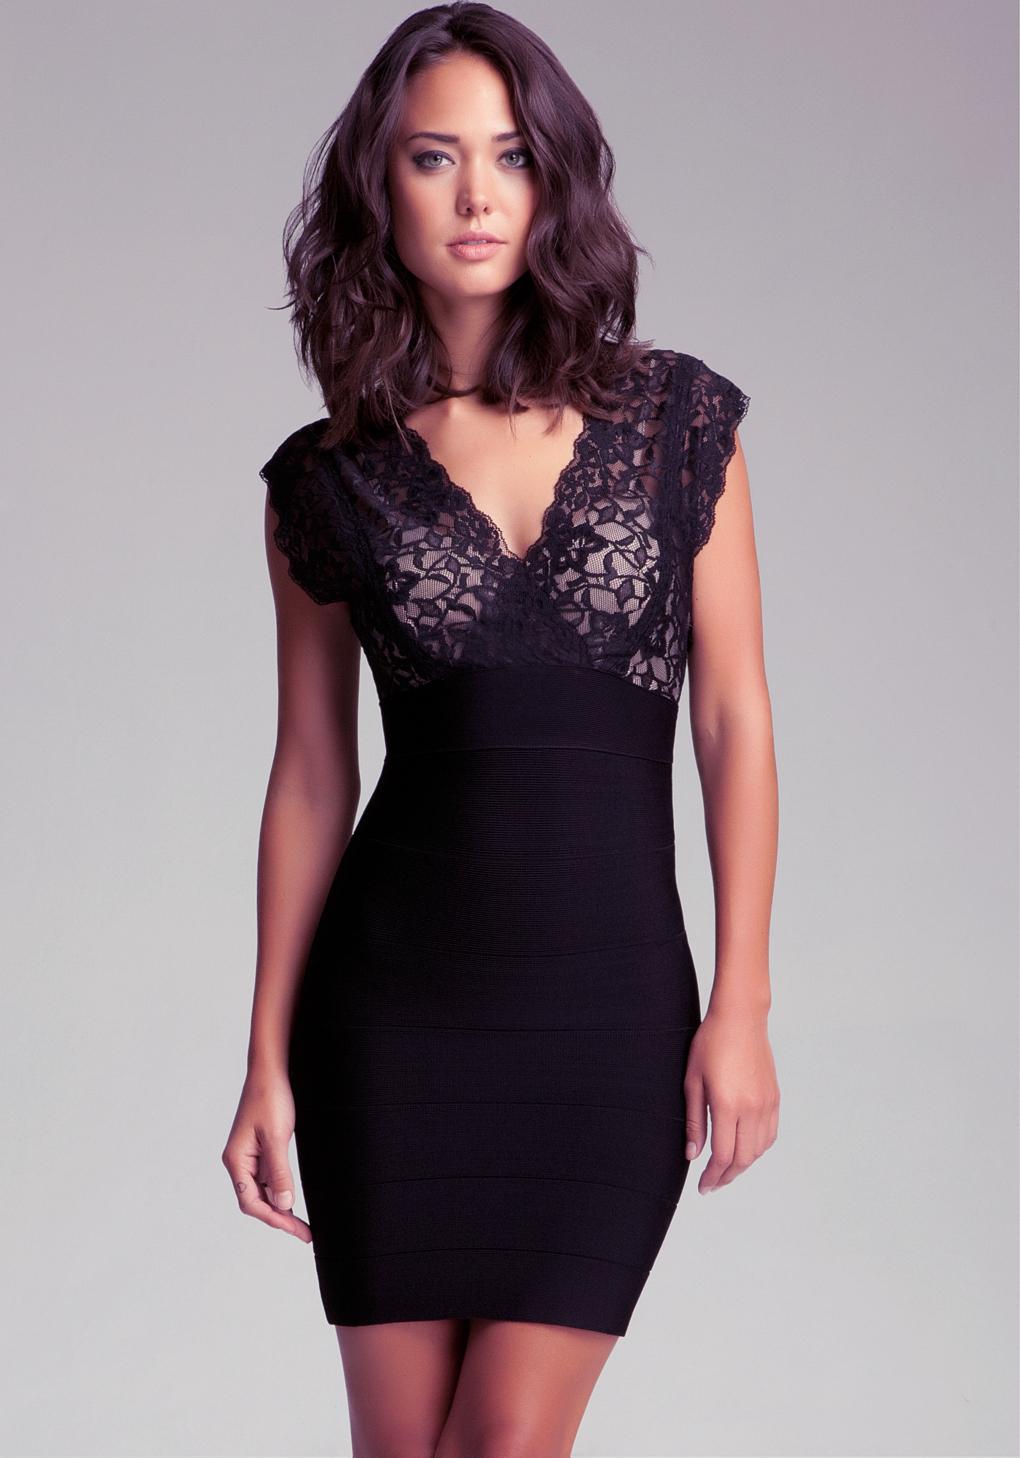 Lyst Bebe Cutout Lace Twofer Bandage Dress In Black